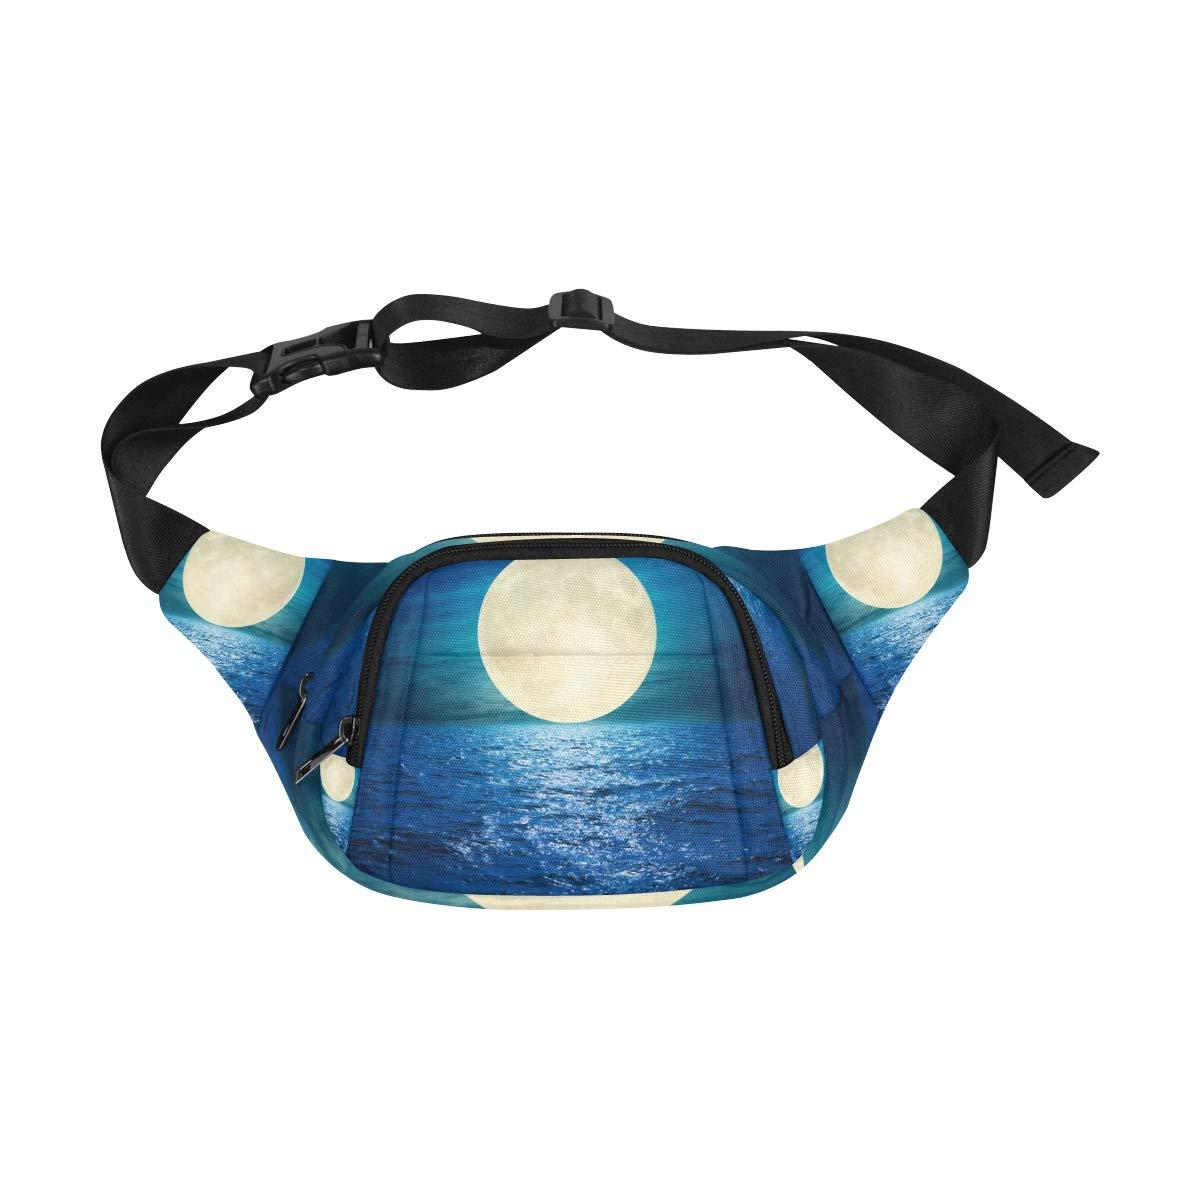 Super Full Moon At Night Over Ocean Fenny Packs Waist Bags Adjustable Belt Waterproof Nylon Travel Running Sport Vacation Party For Men Women Boys Girls Kids